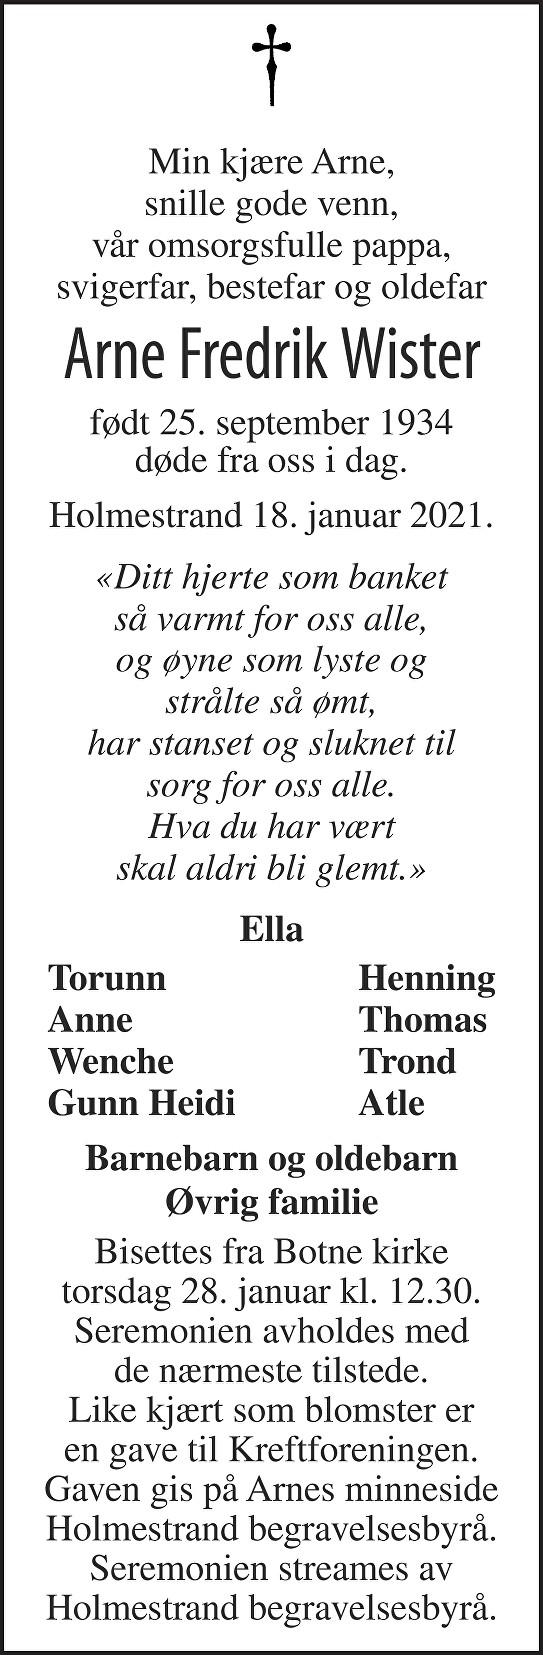 Arne Fredrik Wister Dødsannonse